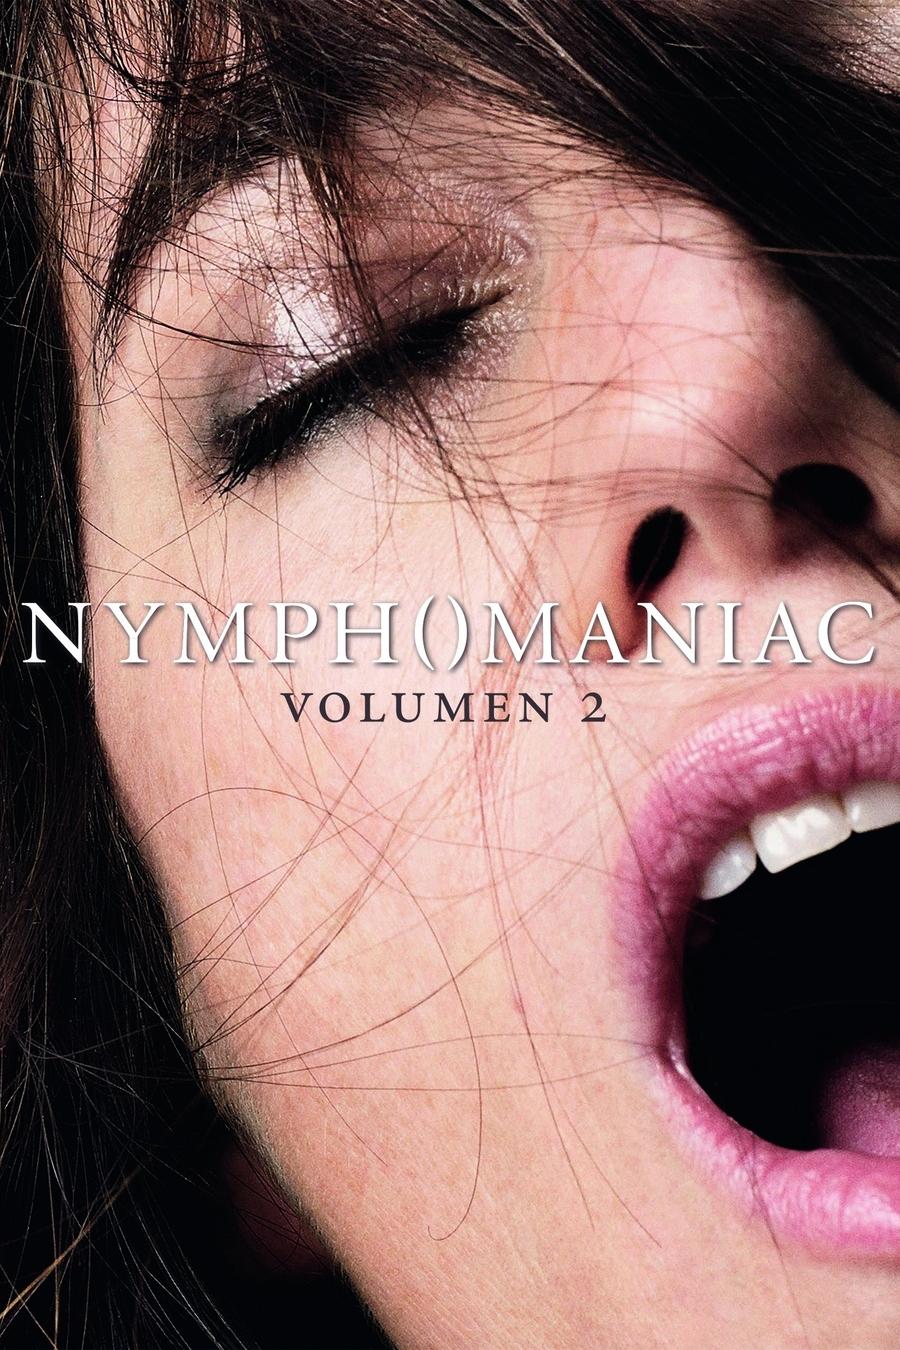 Nymphomaniac: Vol 2